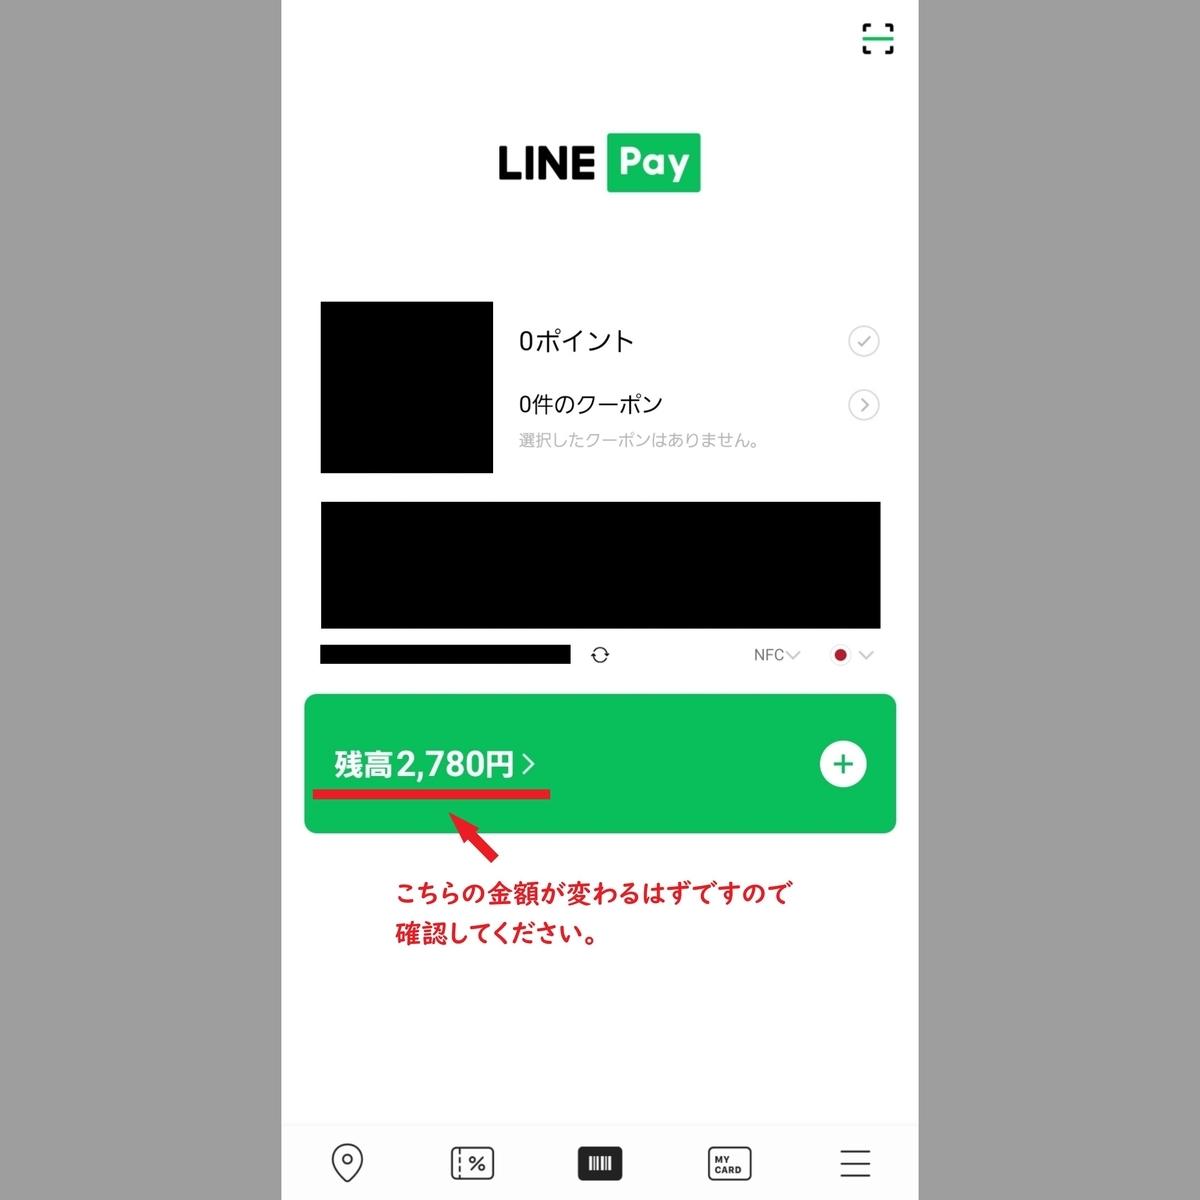 f:id:hihowru:20200322235258j:plain